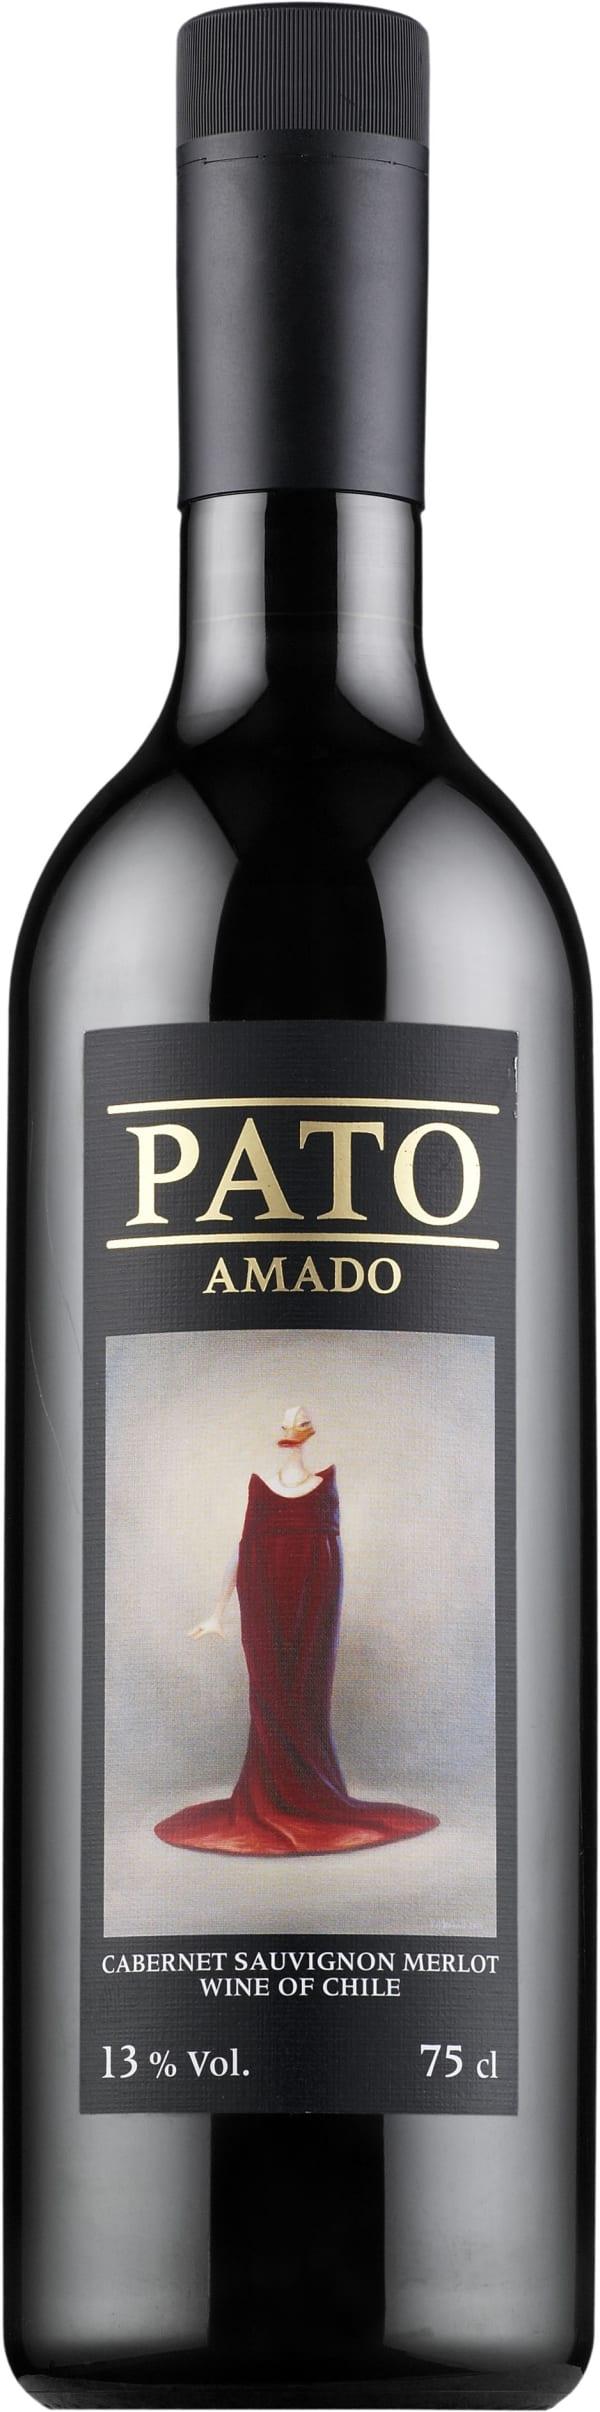 Pato Amado plastic bottle